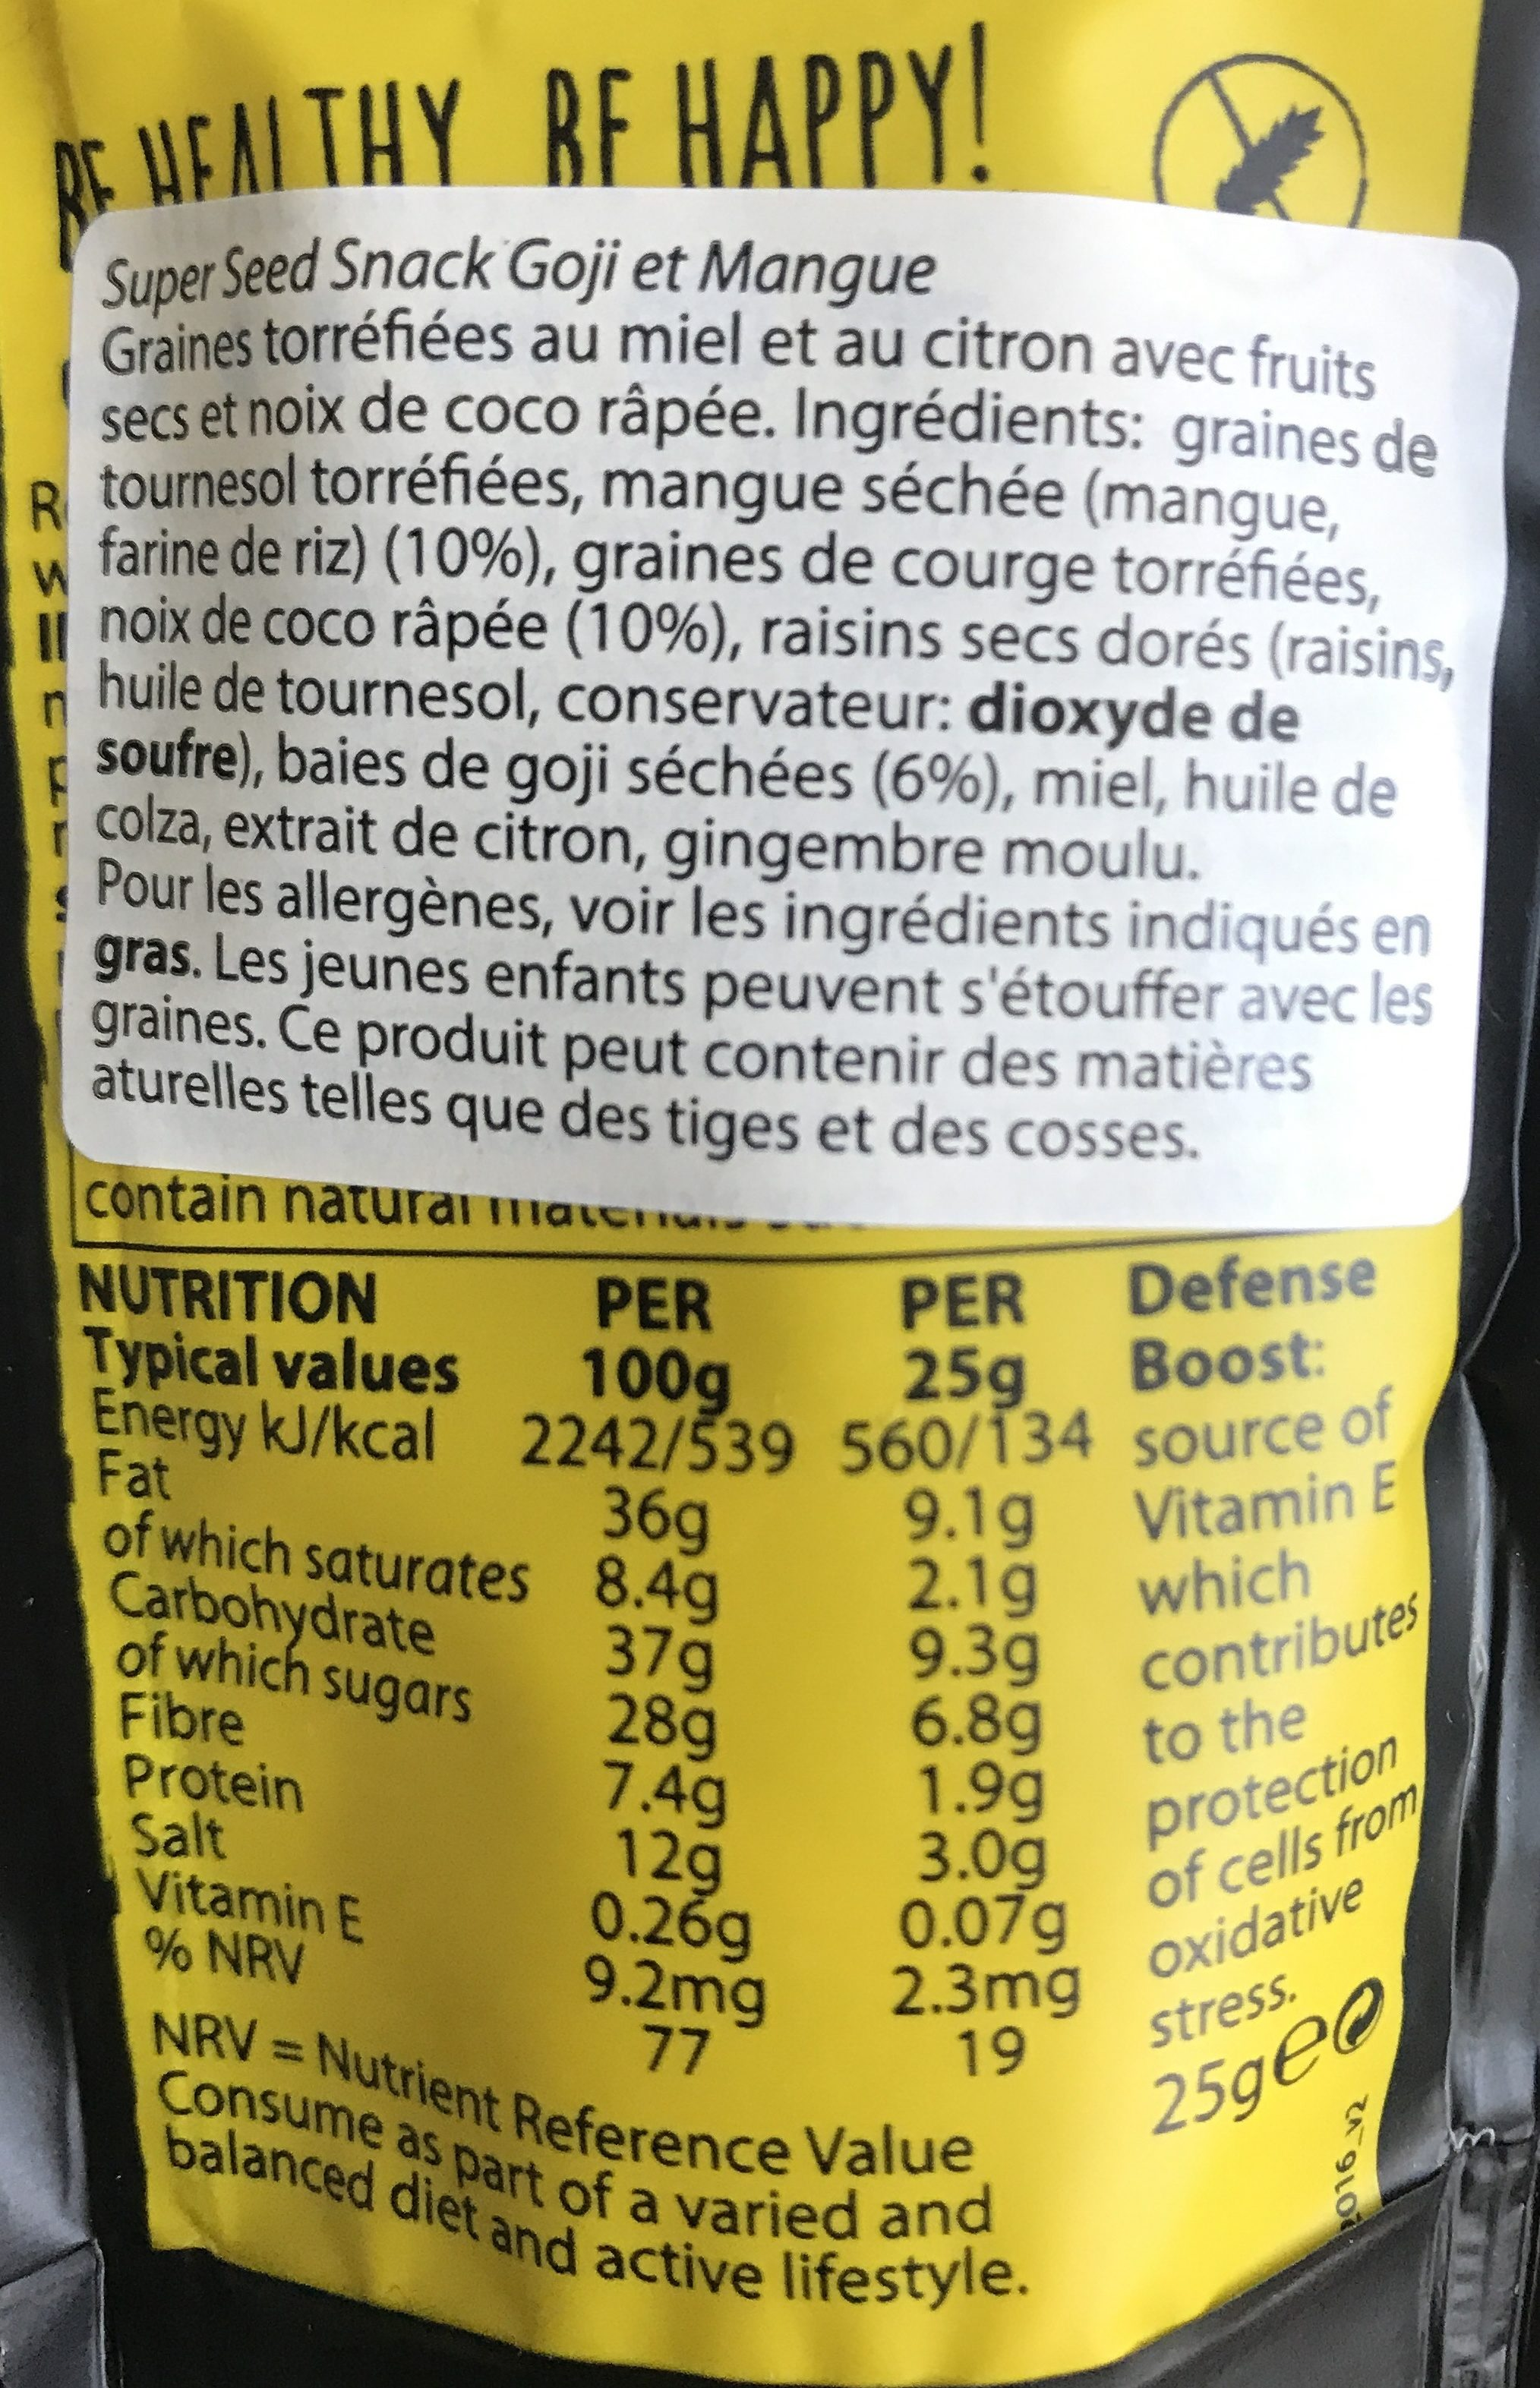 Good4u Super Seed Goji / Mango Snack - Ingredients